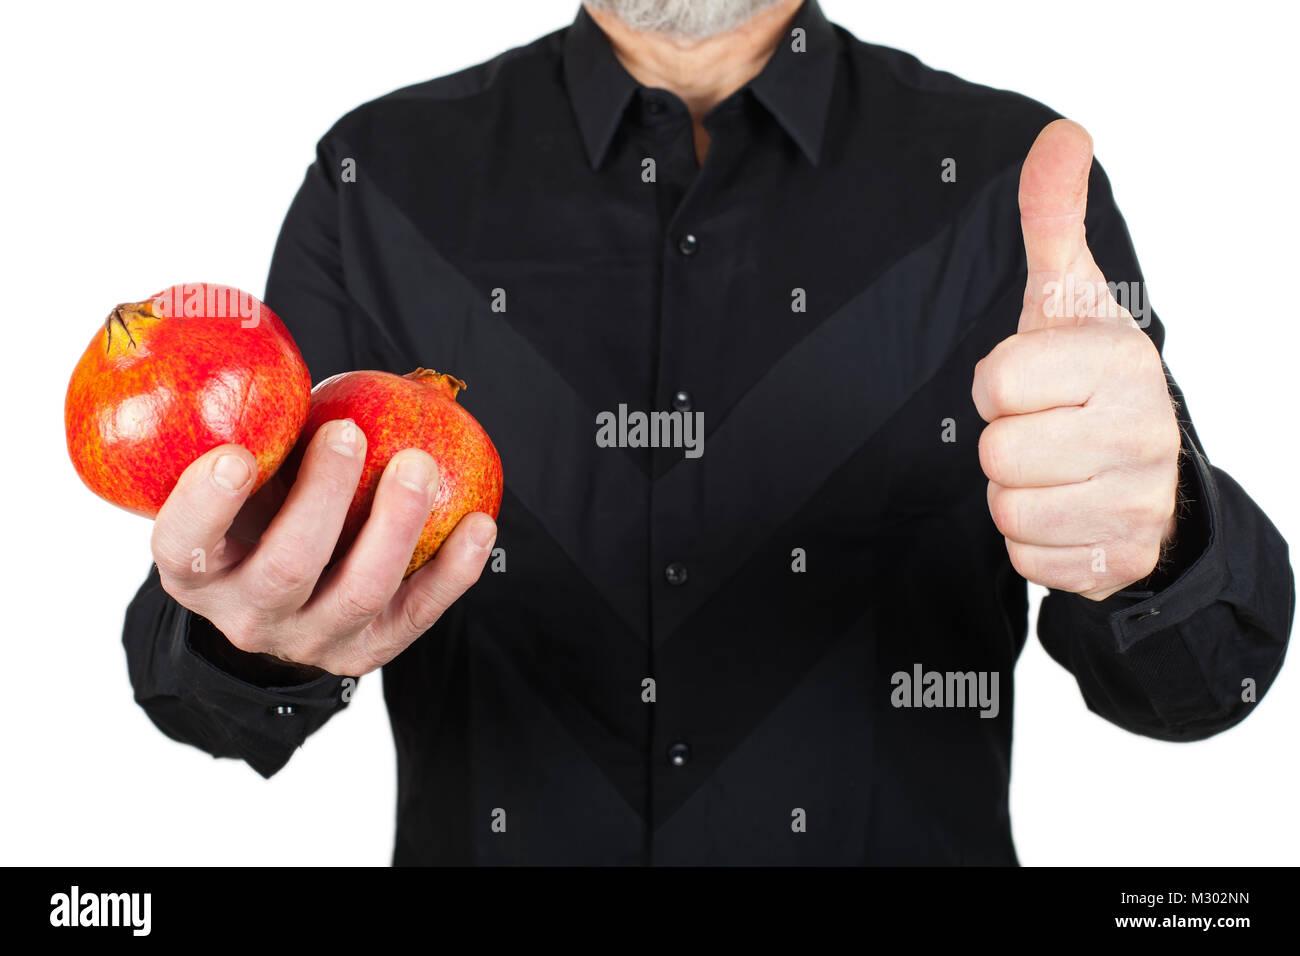 Cerrar imagen de hombre de negro sujetando la granada madura, alto de frutas antioxidantes, mostrando Thumbs up Imagen De Stock